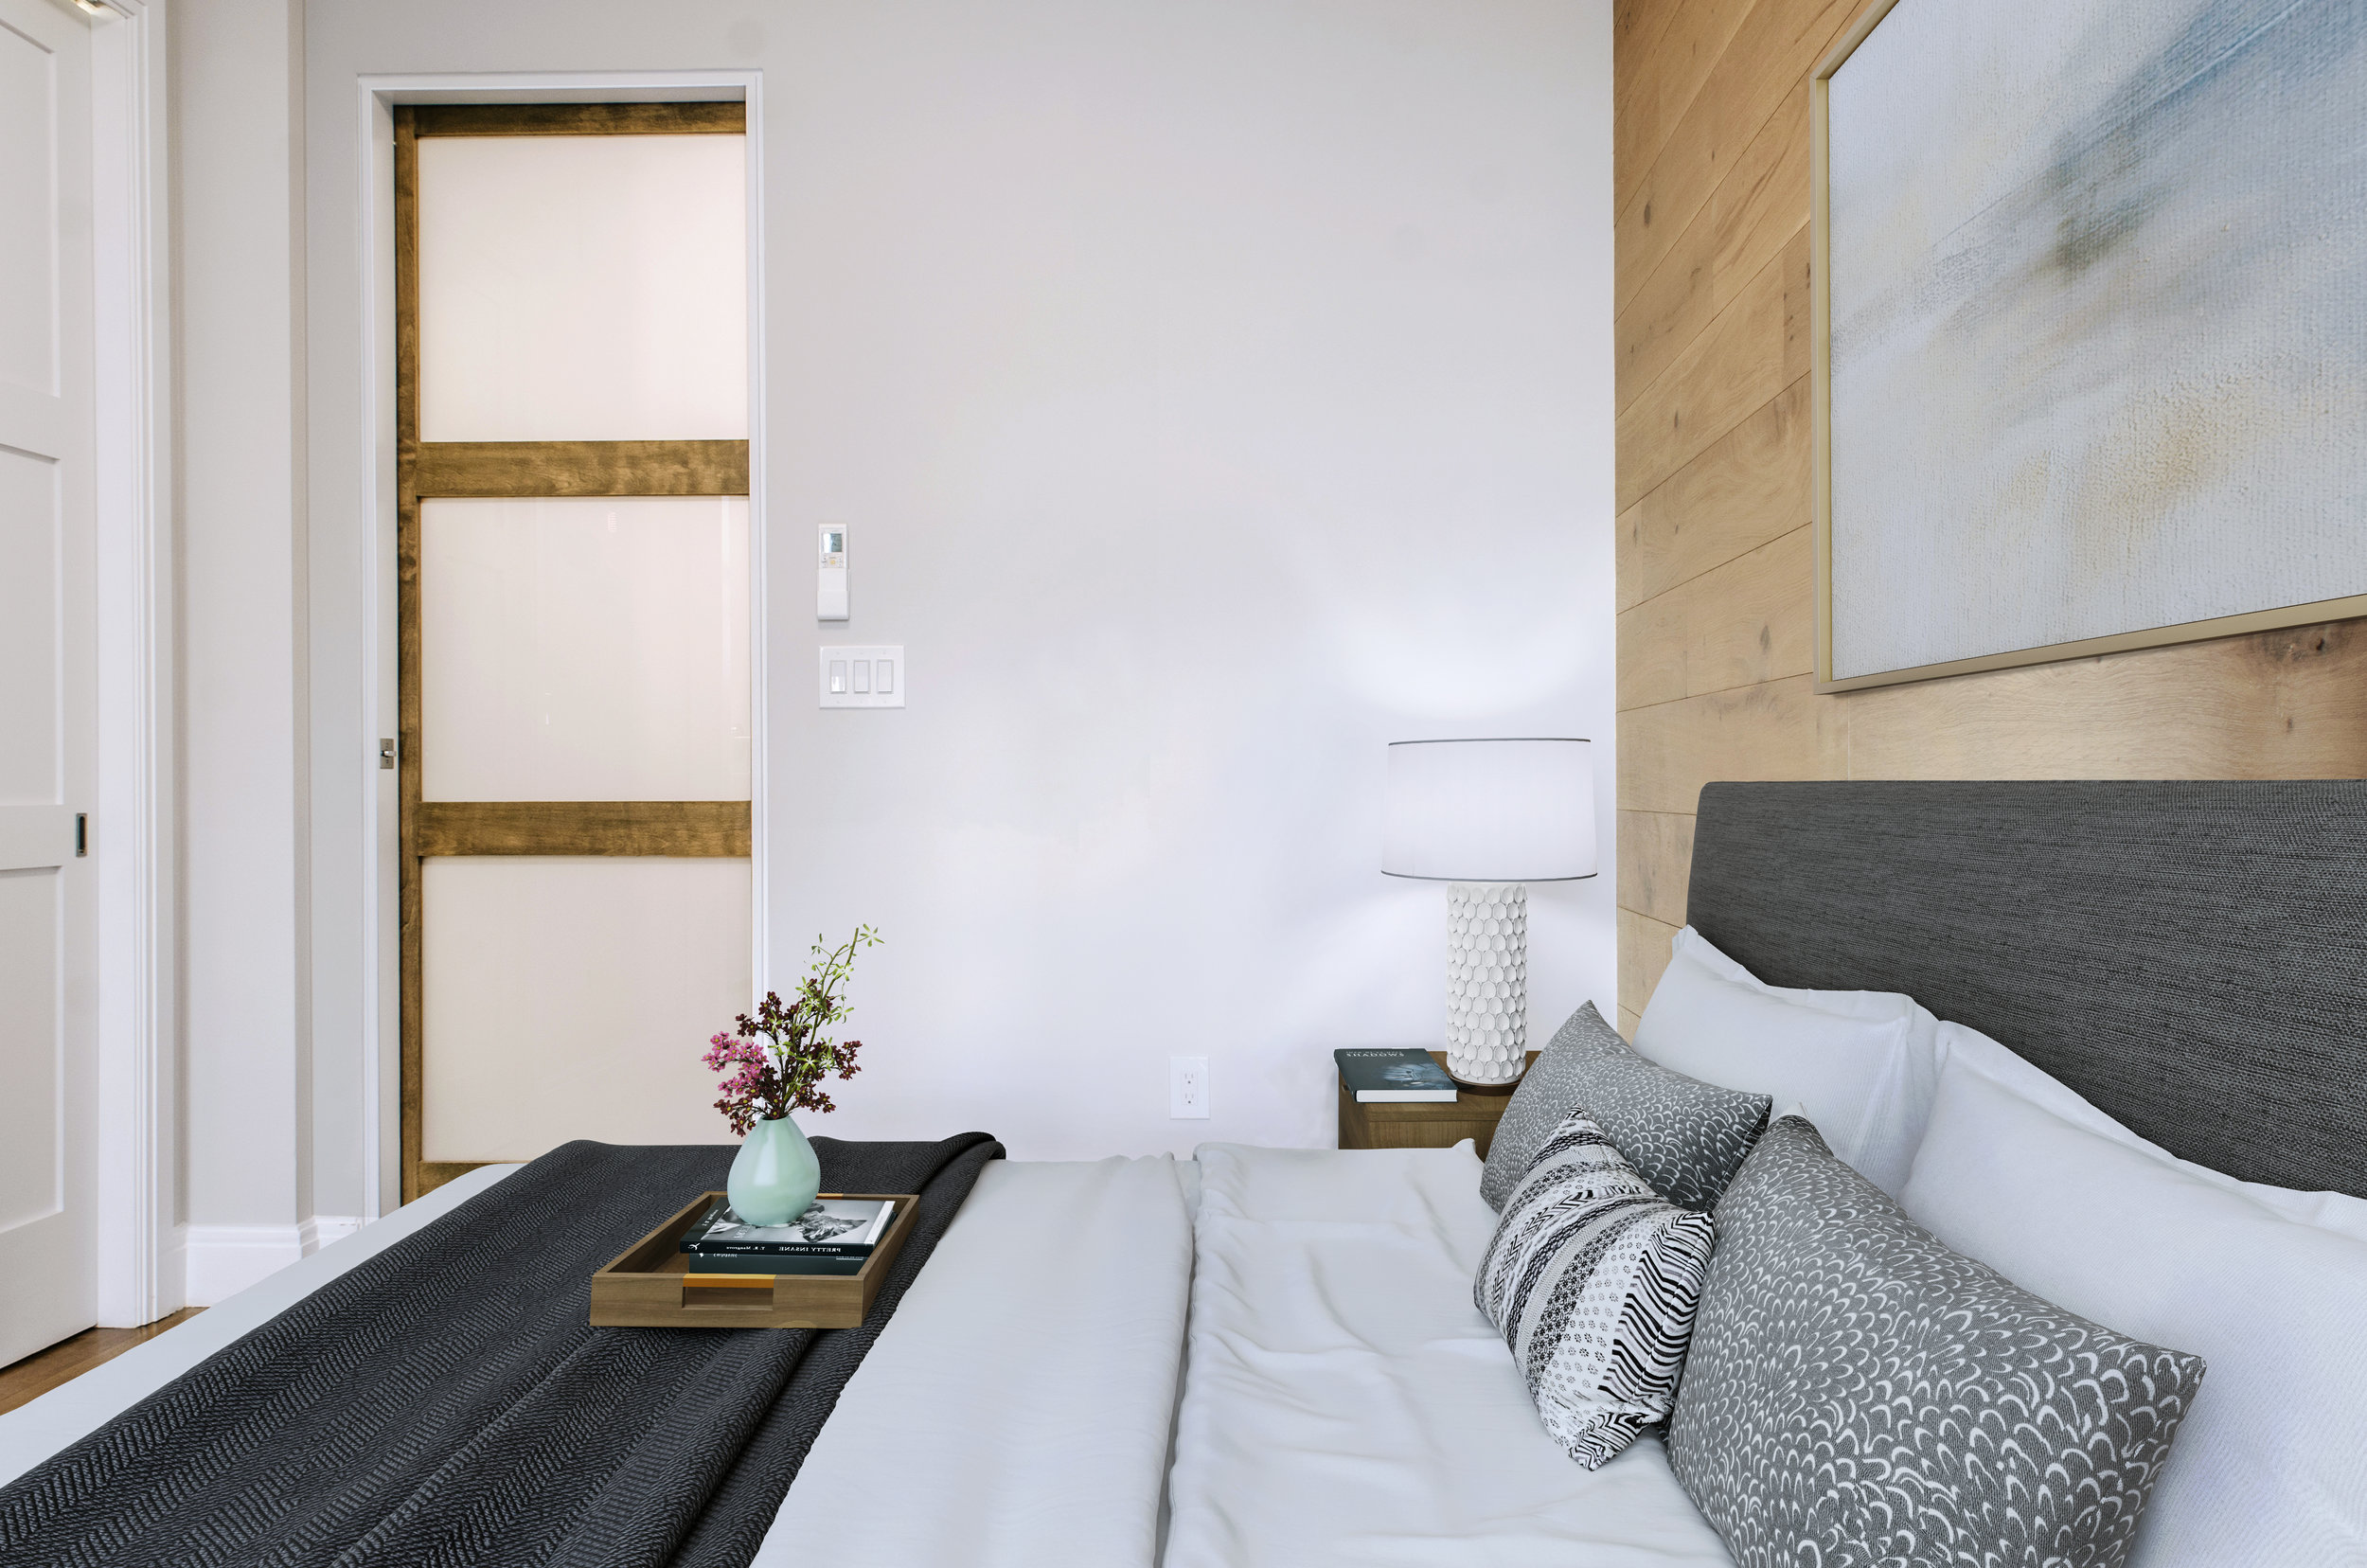 Brandon_333_East_83rd_Second_bedroom_staged_NZ.jpg